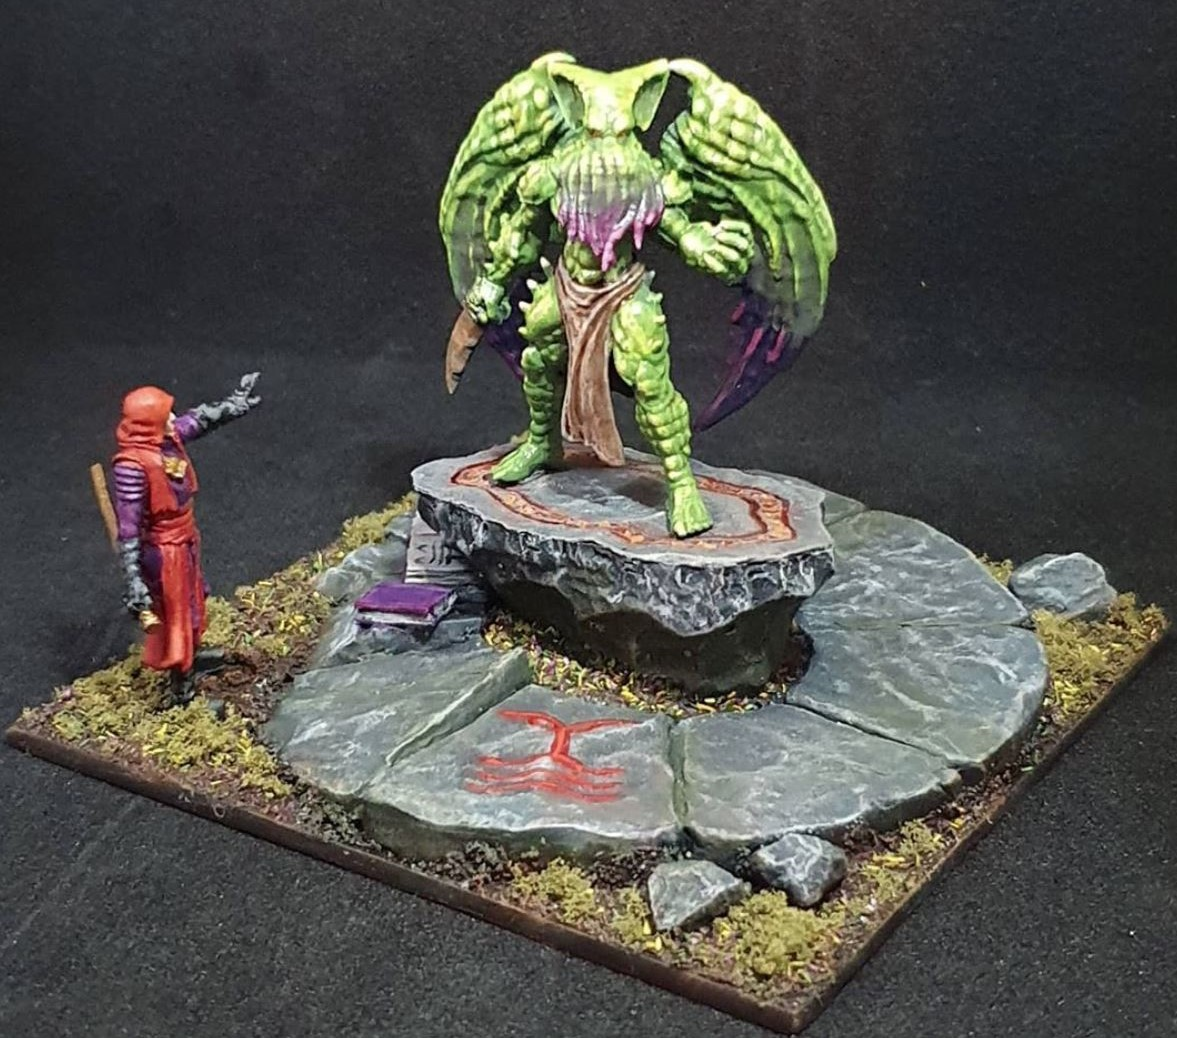 asset drop villains, bushido miniatures